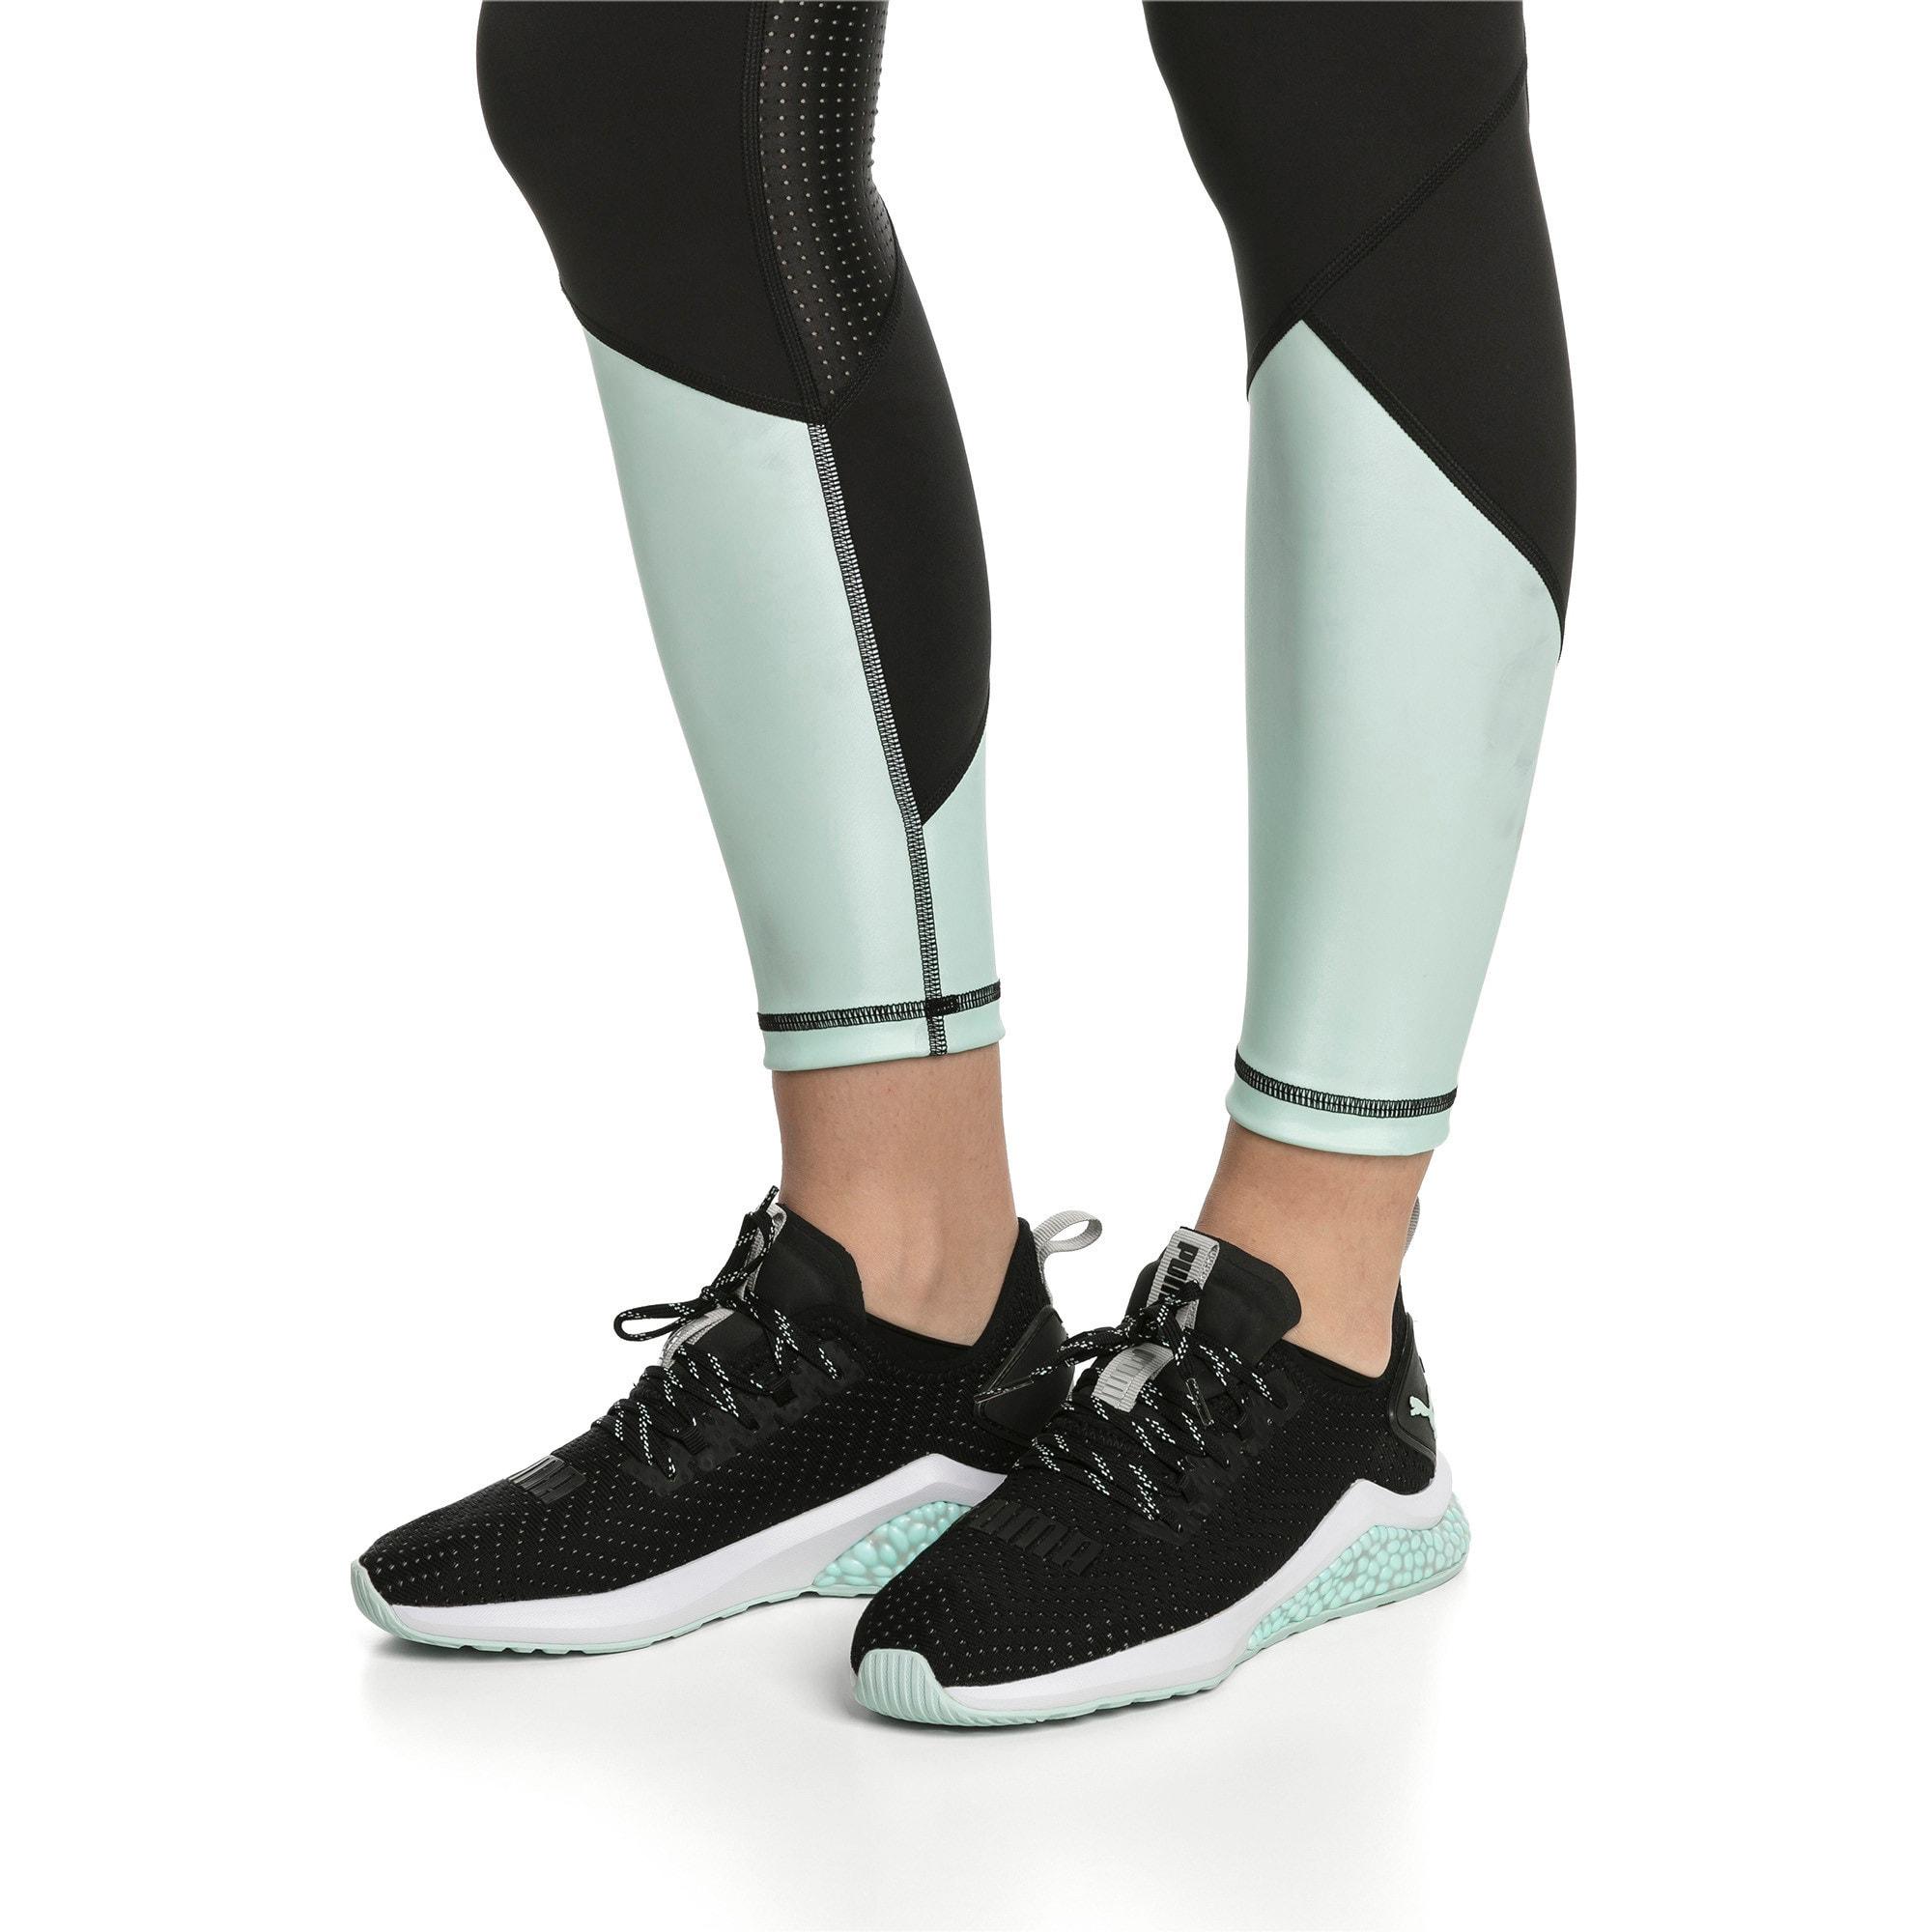 Thumbnail 2 of HYBRID NX Trailblazer Women's Running Shoes, Black-Fair Aqua-Pale Pink, medium